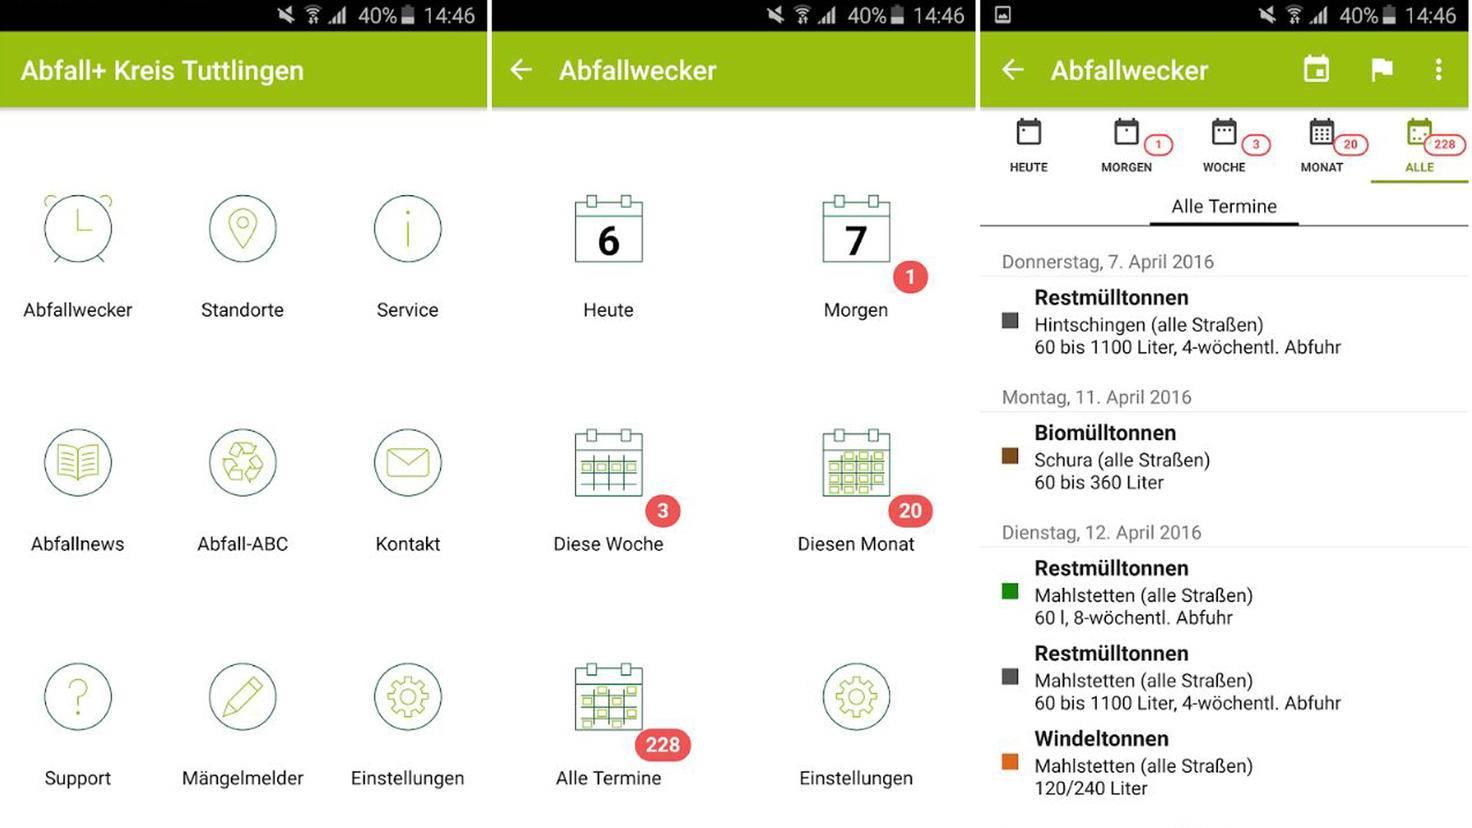 Abfall+ App